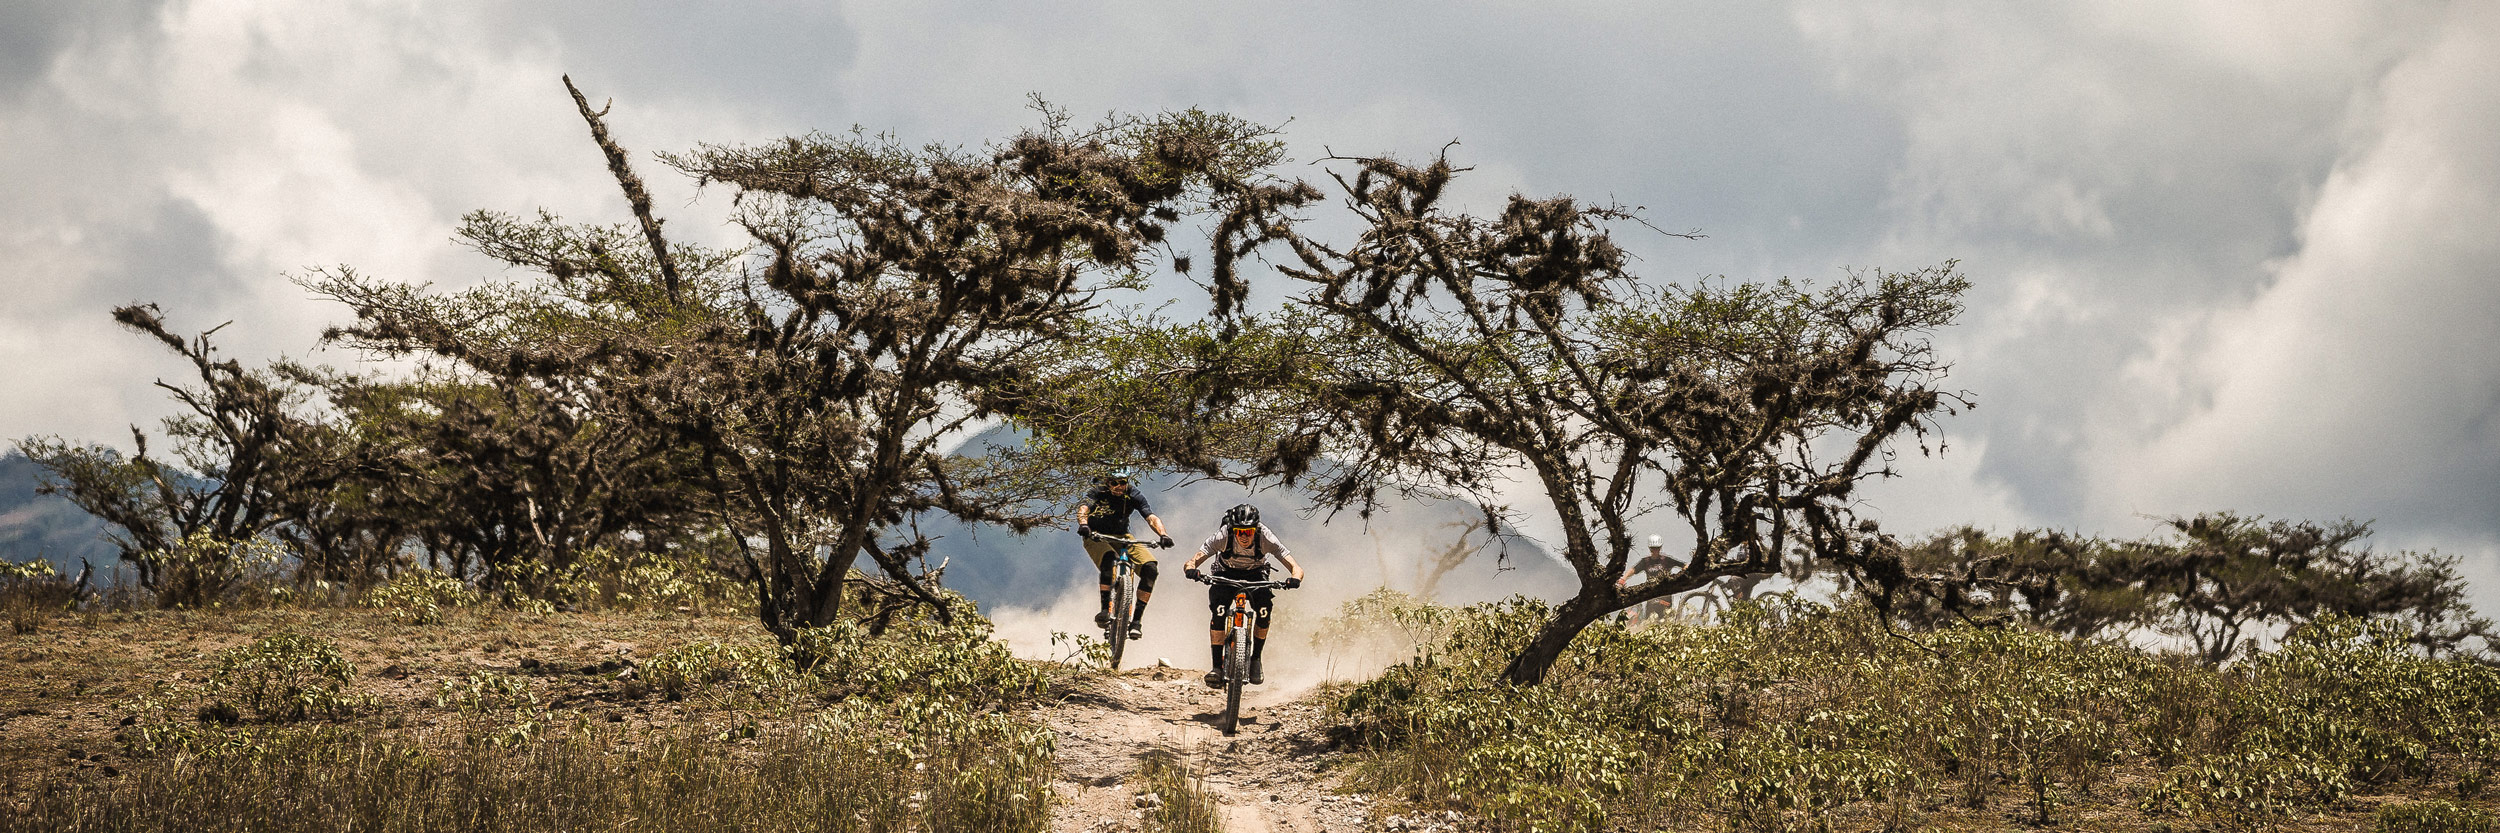 Mountain bike tours Ecuador, South America